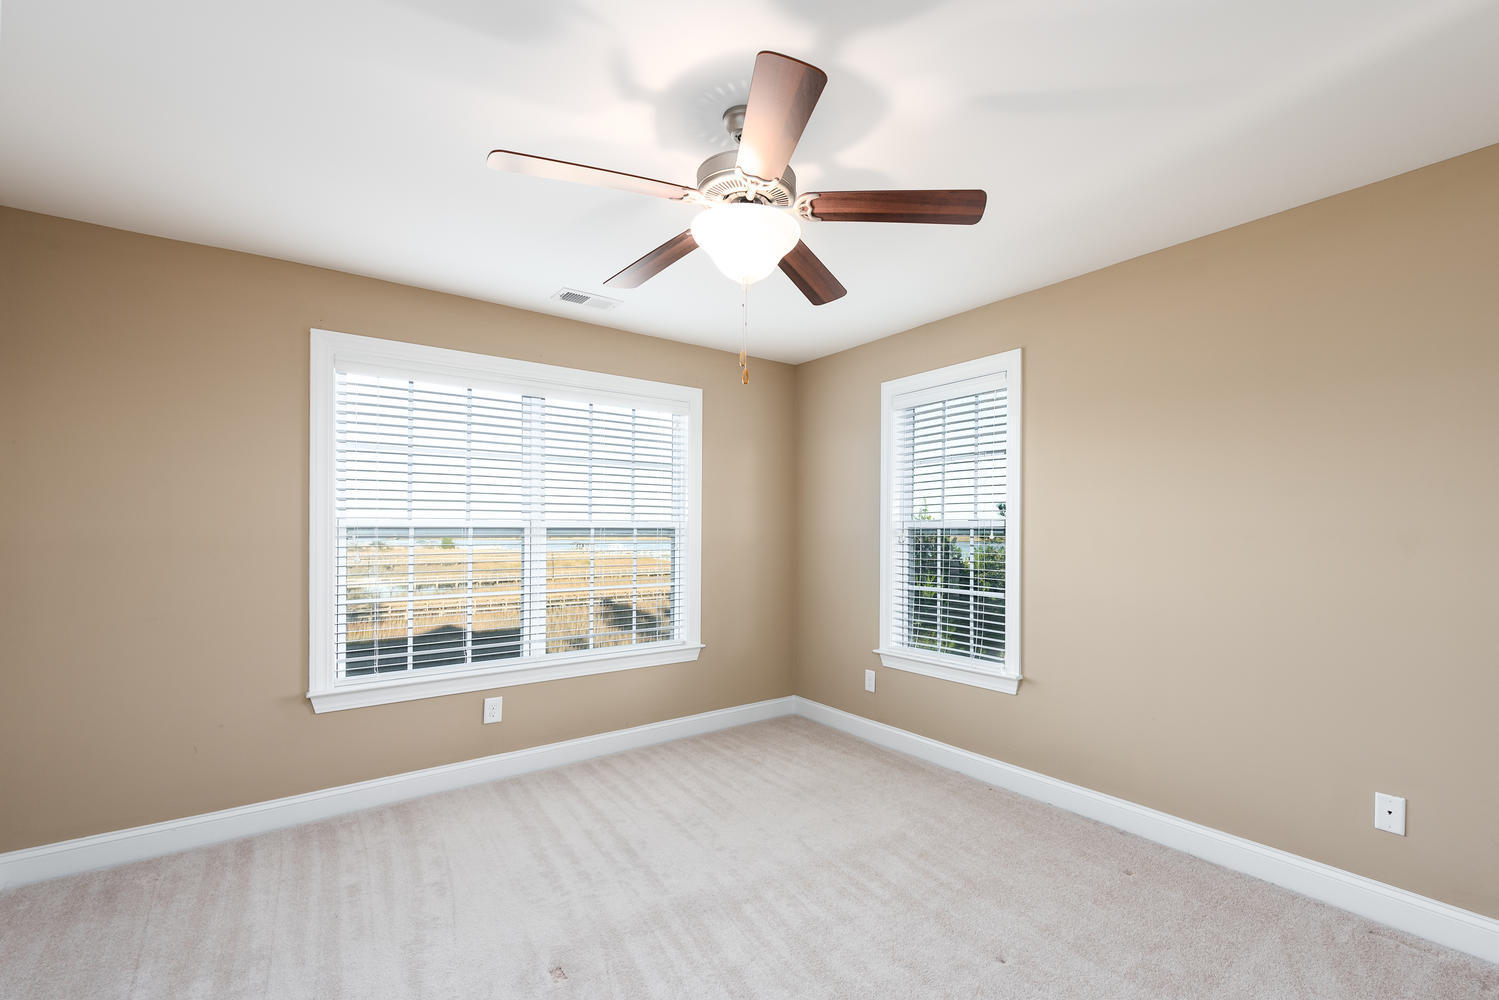 River Reach Pointe Homes For Sale - 1216 Rivers Reach Drive, Charleston, SC - 33